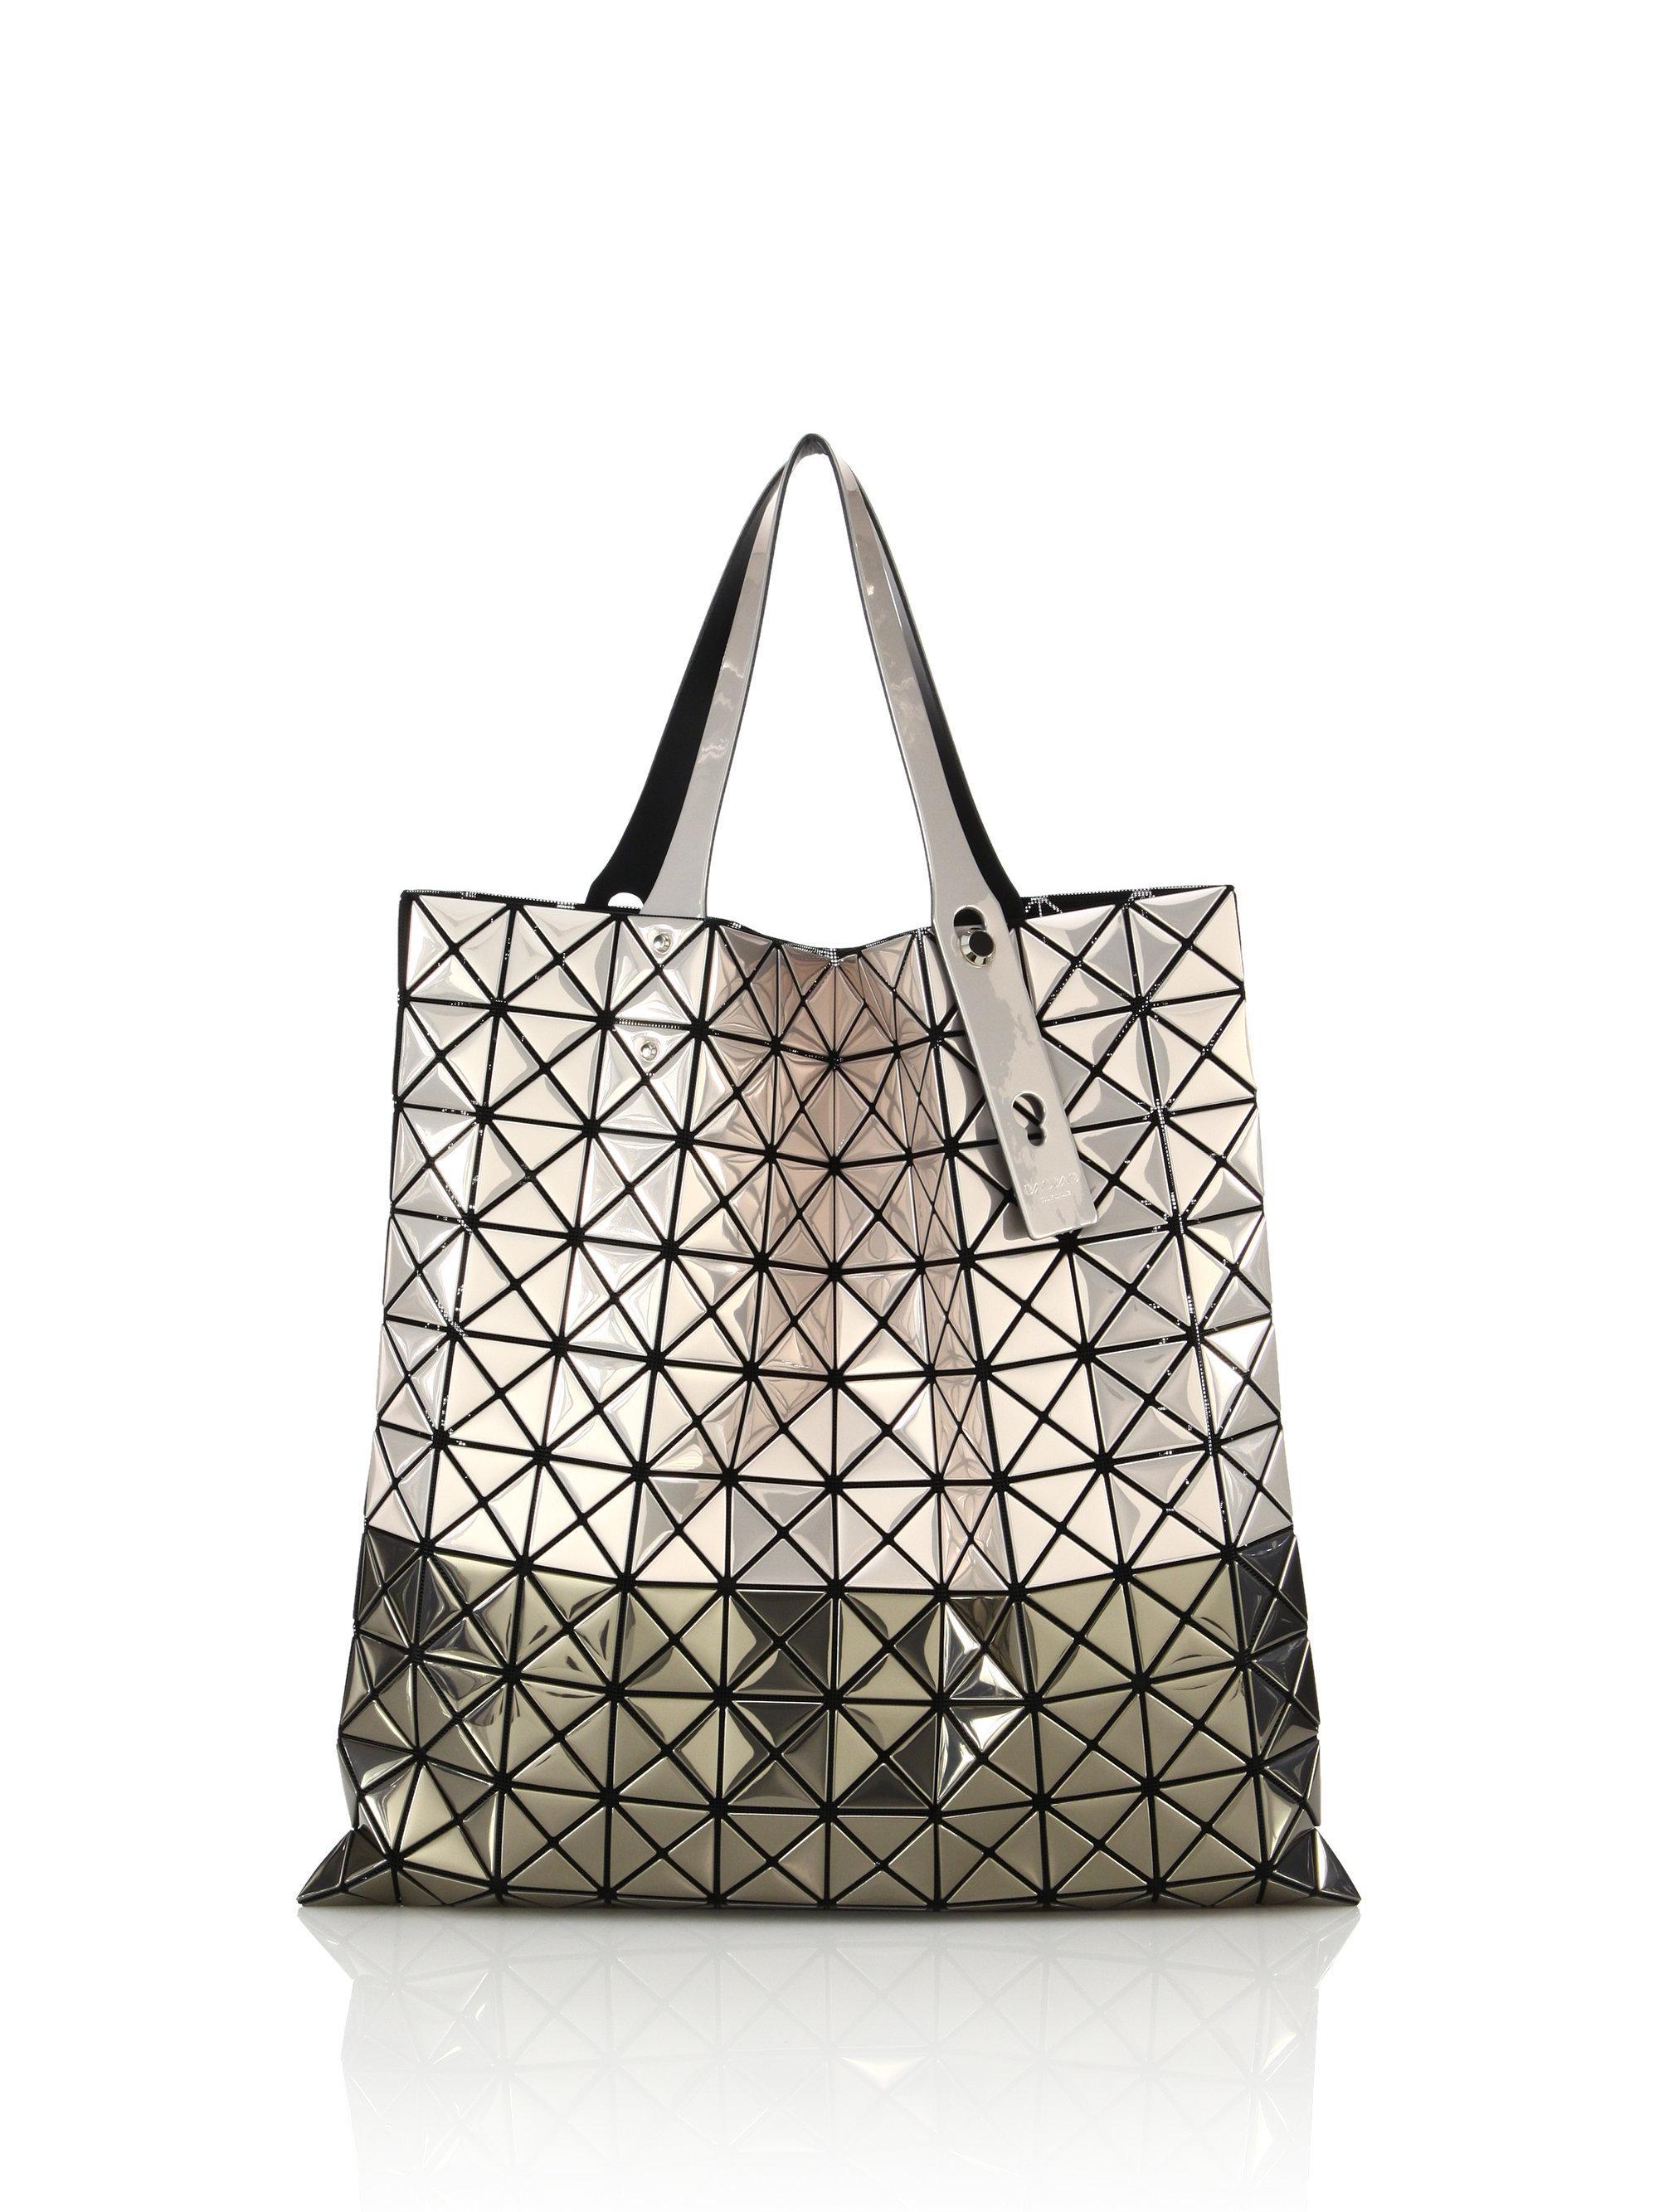 Pre-owned - Bao Bao leather handbag Issey Miyake jLzuo30